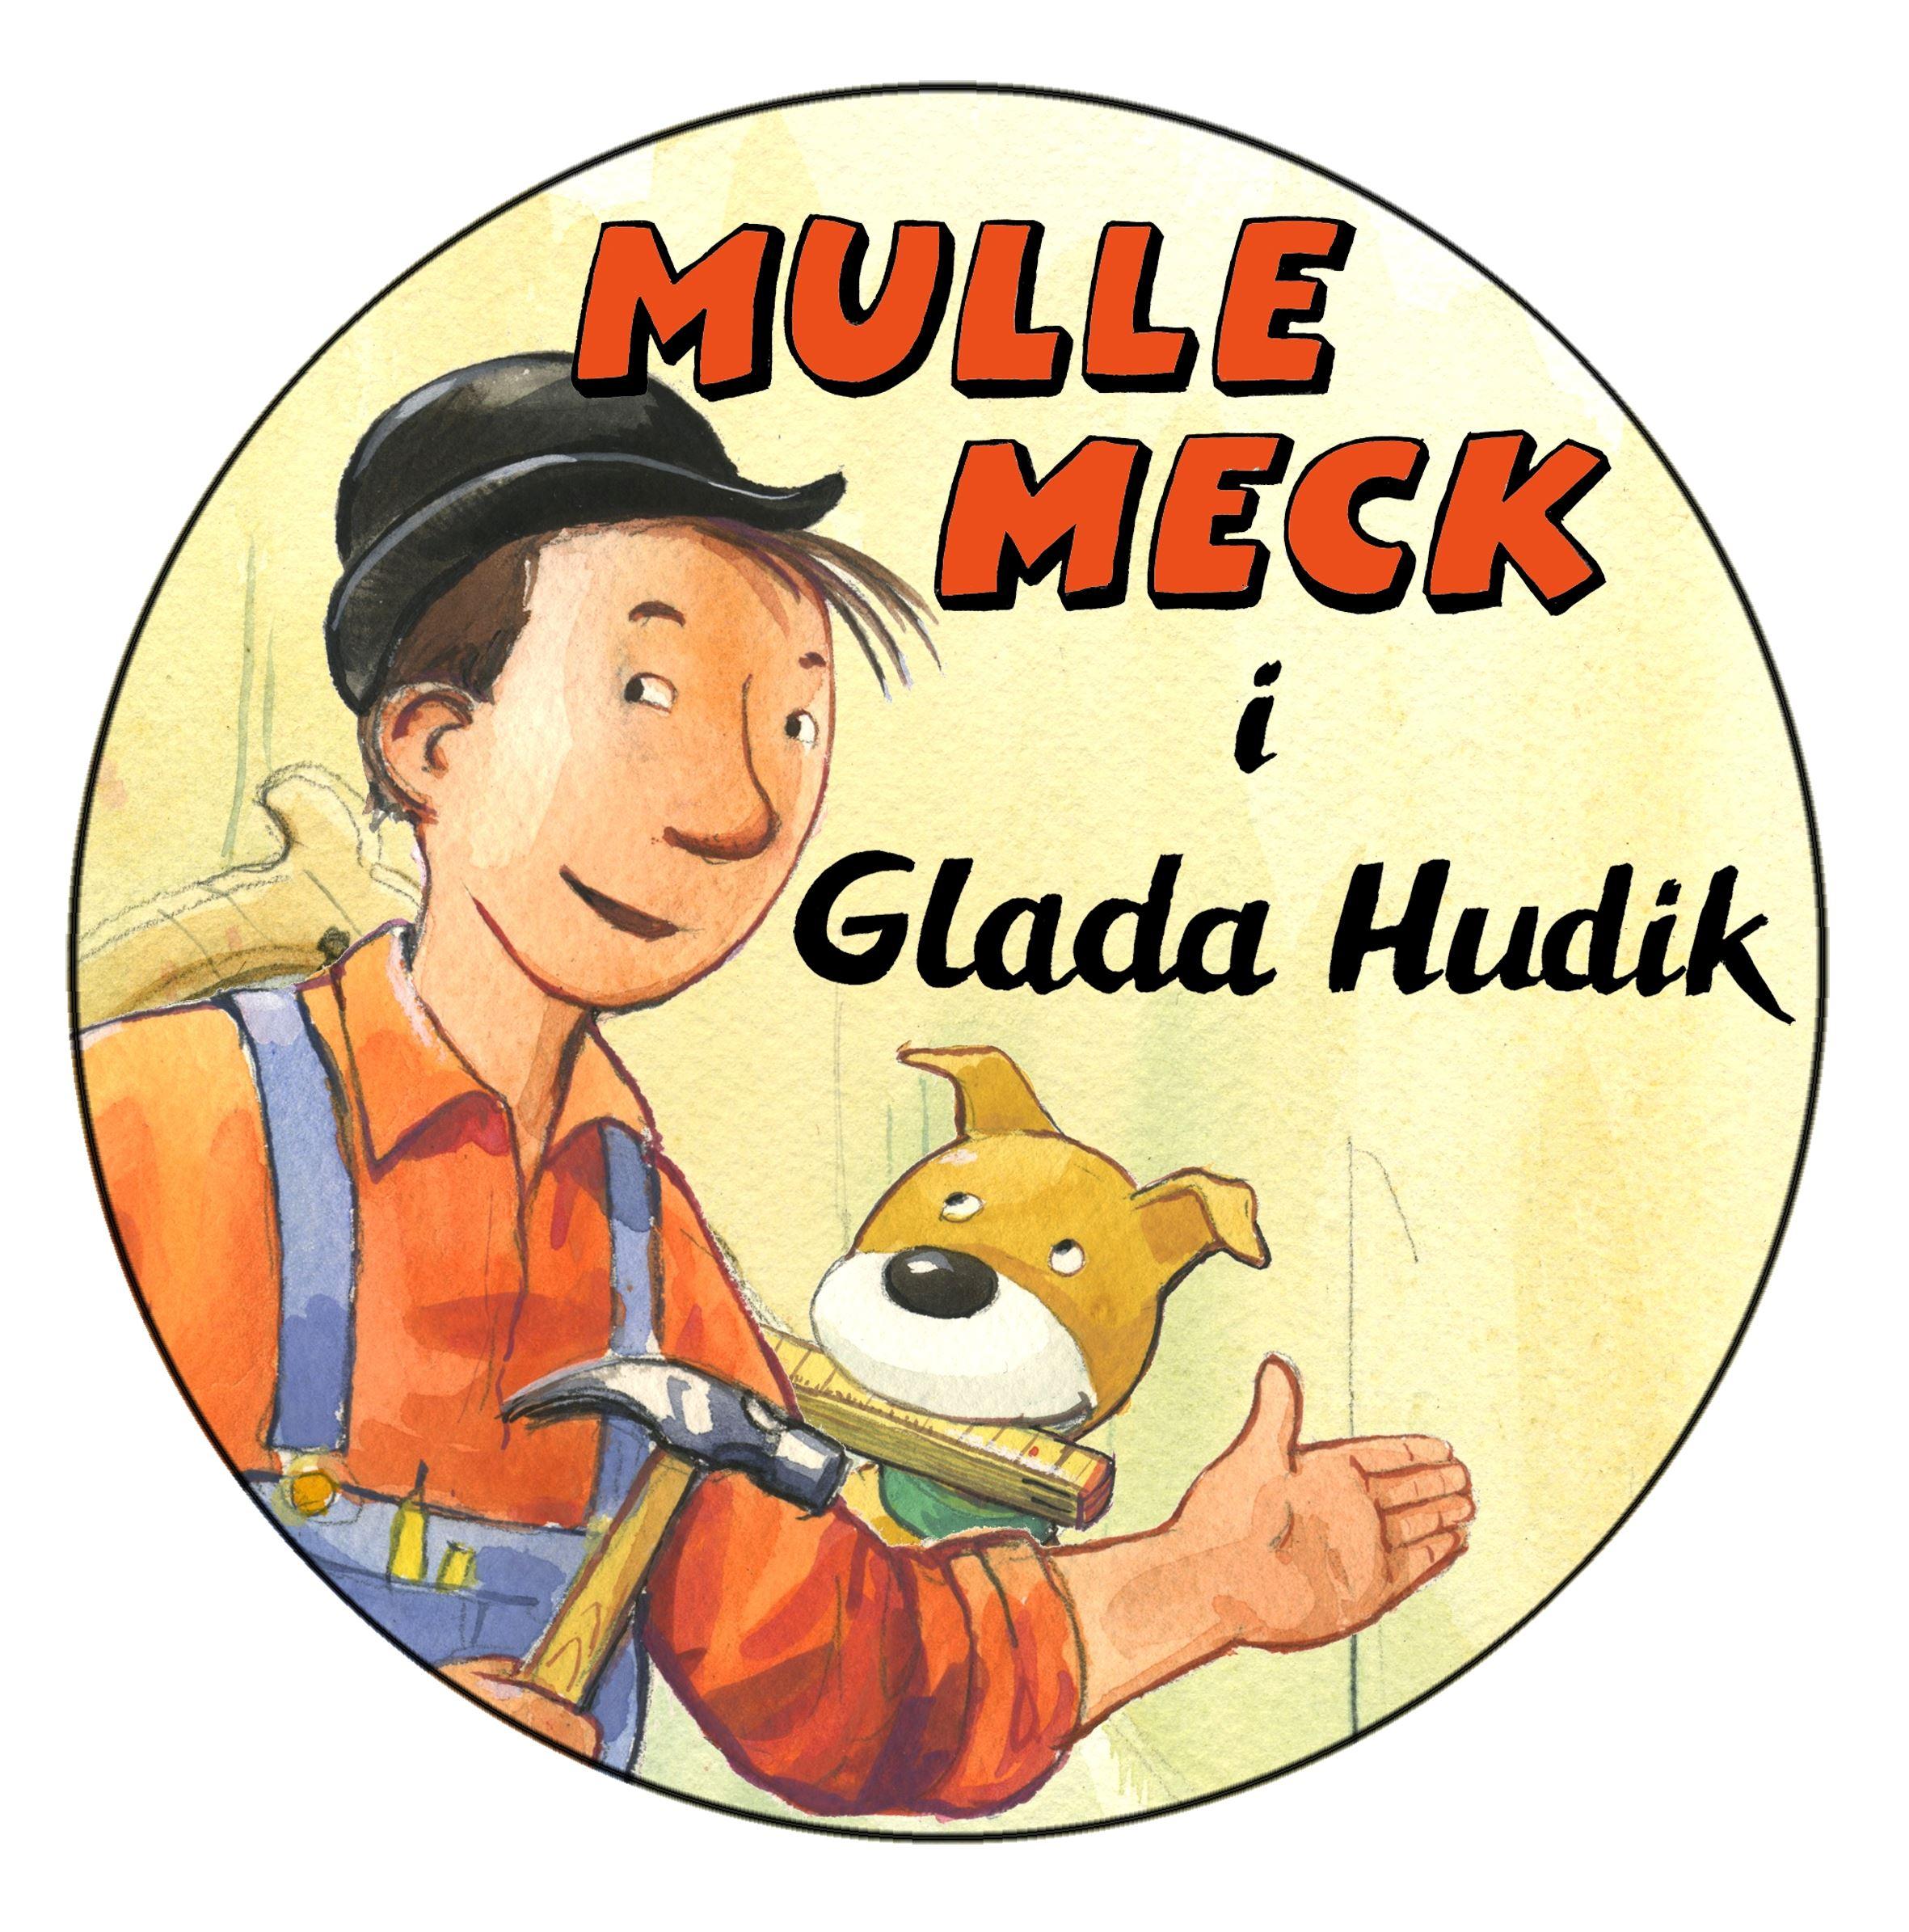 © Mulle Meck i Glada Hudik, Mulle Meck firar 25 år!